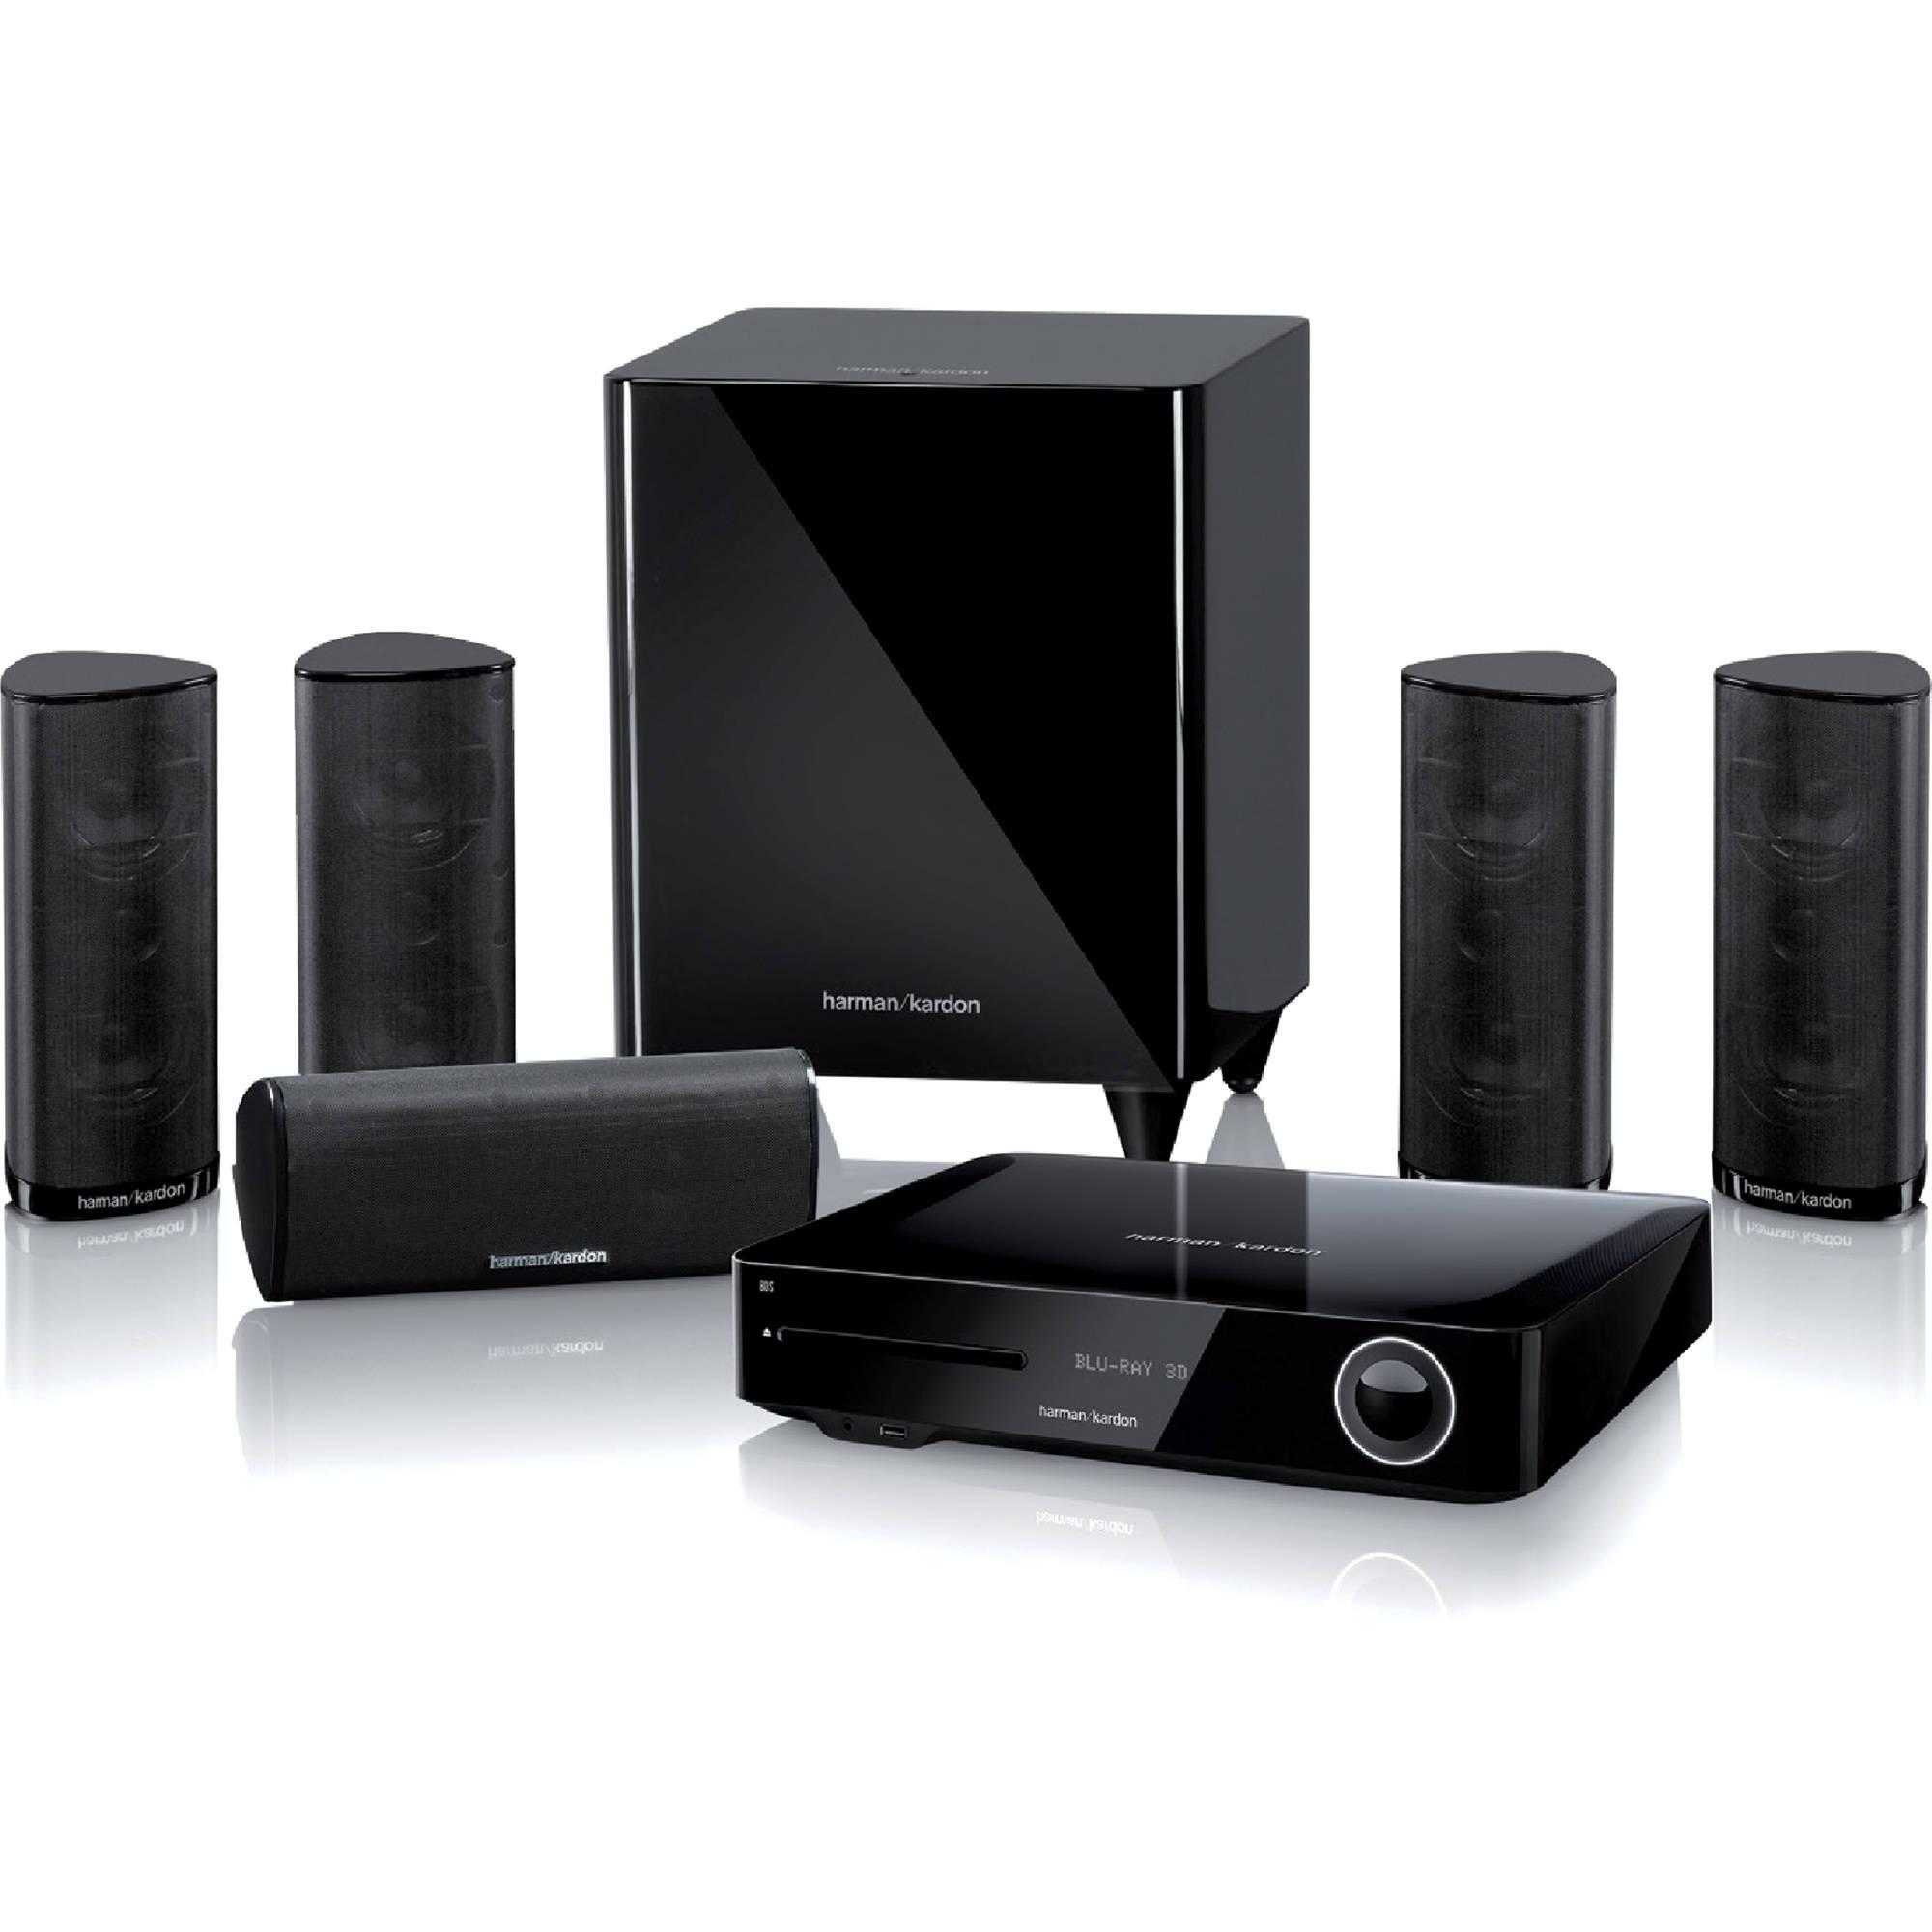 Harman Kardon Audio System